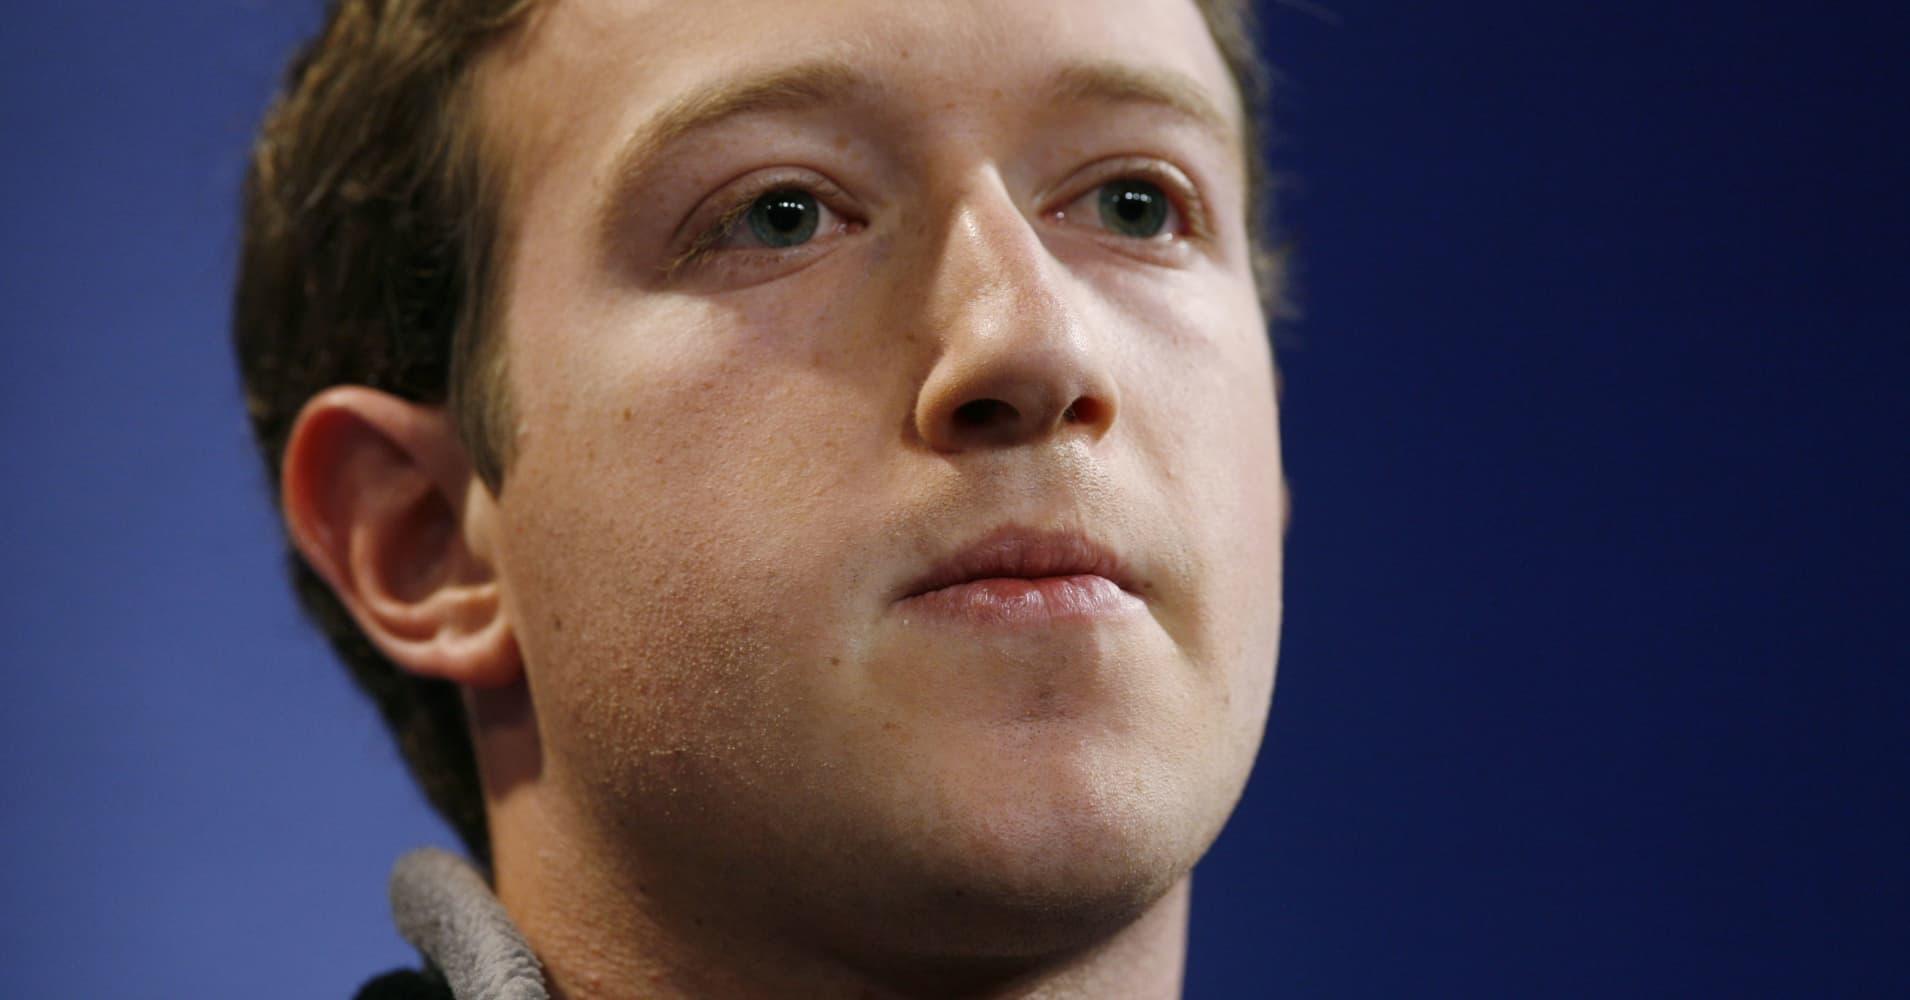 Tech stocks soar 3%, but Facebook lags behind